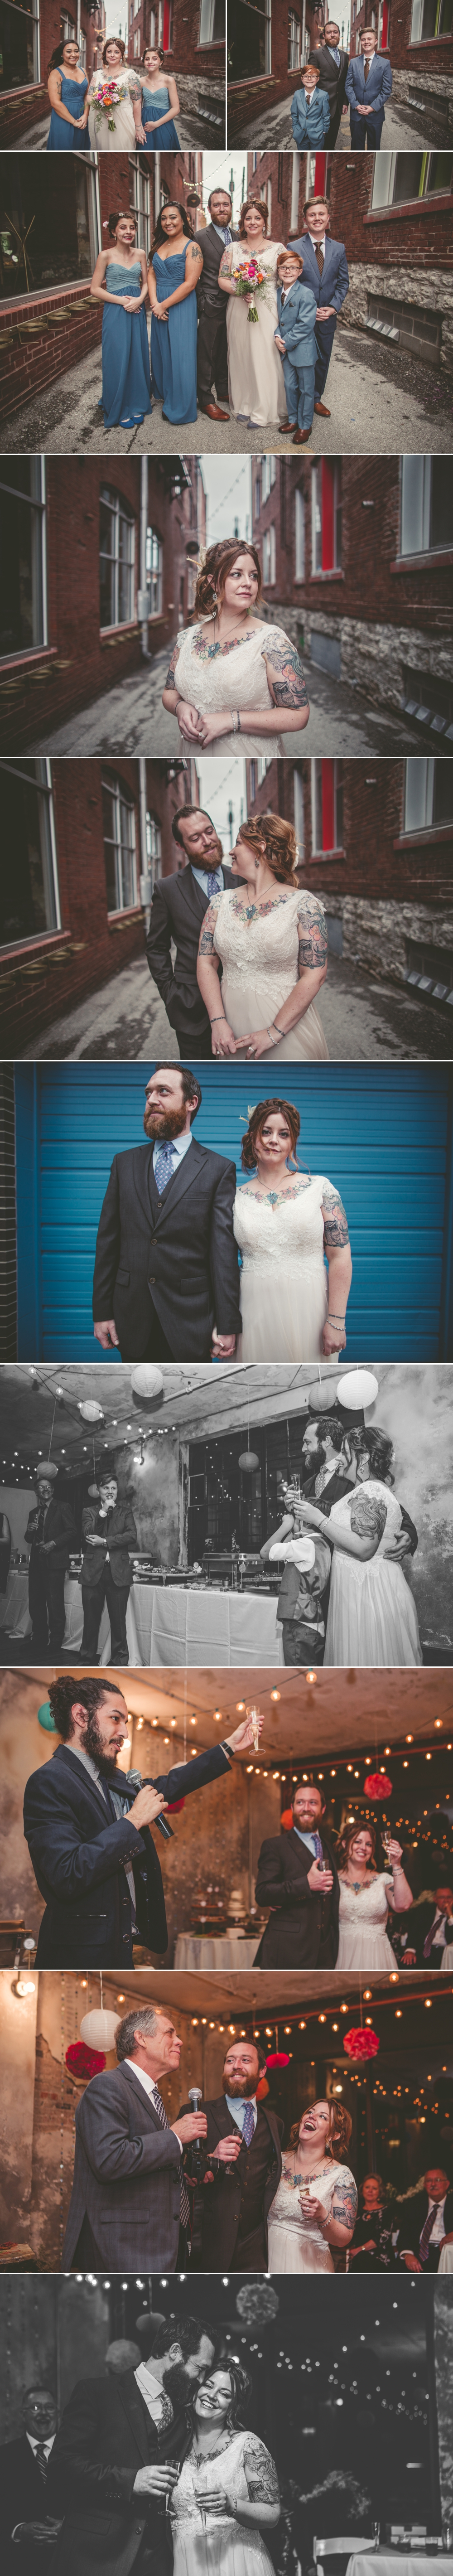 amber_eric_wedding_jason_domingues_photography_best_kansas_city_photographer_downtown_kc_weddings_the_bauer_0003